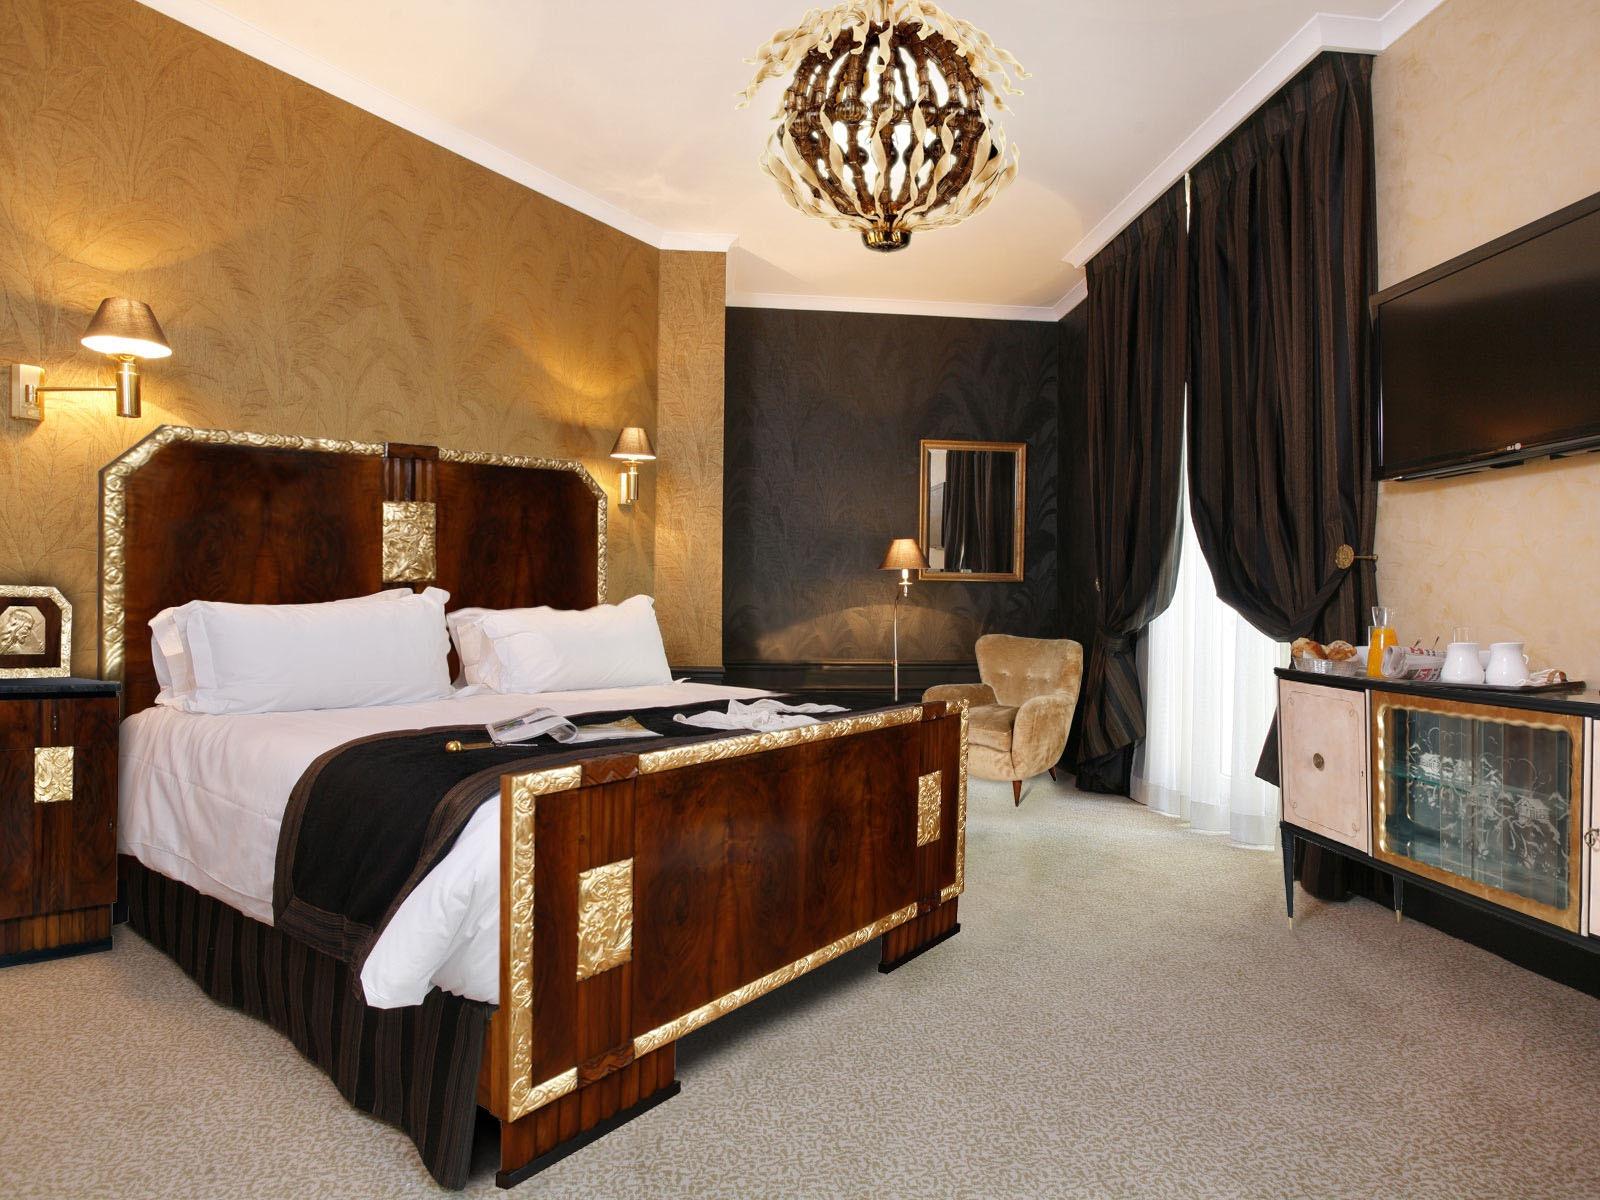 Elegance Luxury Bedroom With Art Deco Lamps (View 10 of 13)